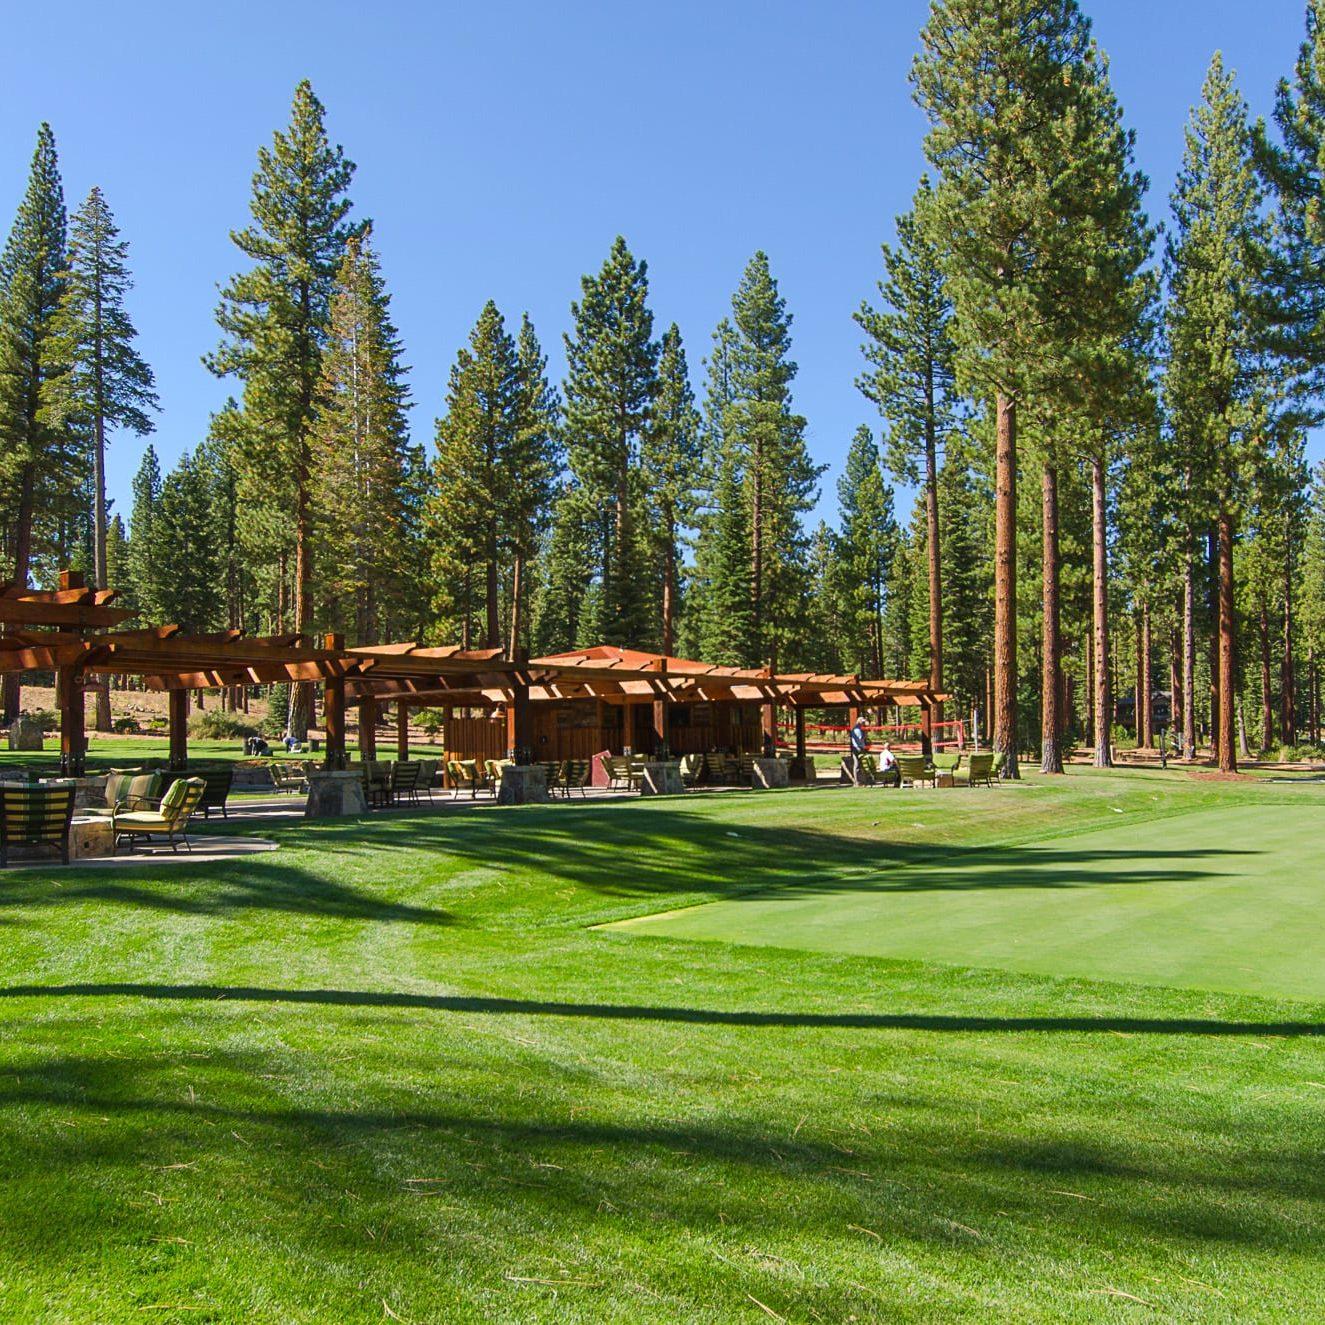 tahoe-city-california-lawn-maintenance-service